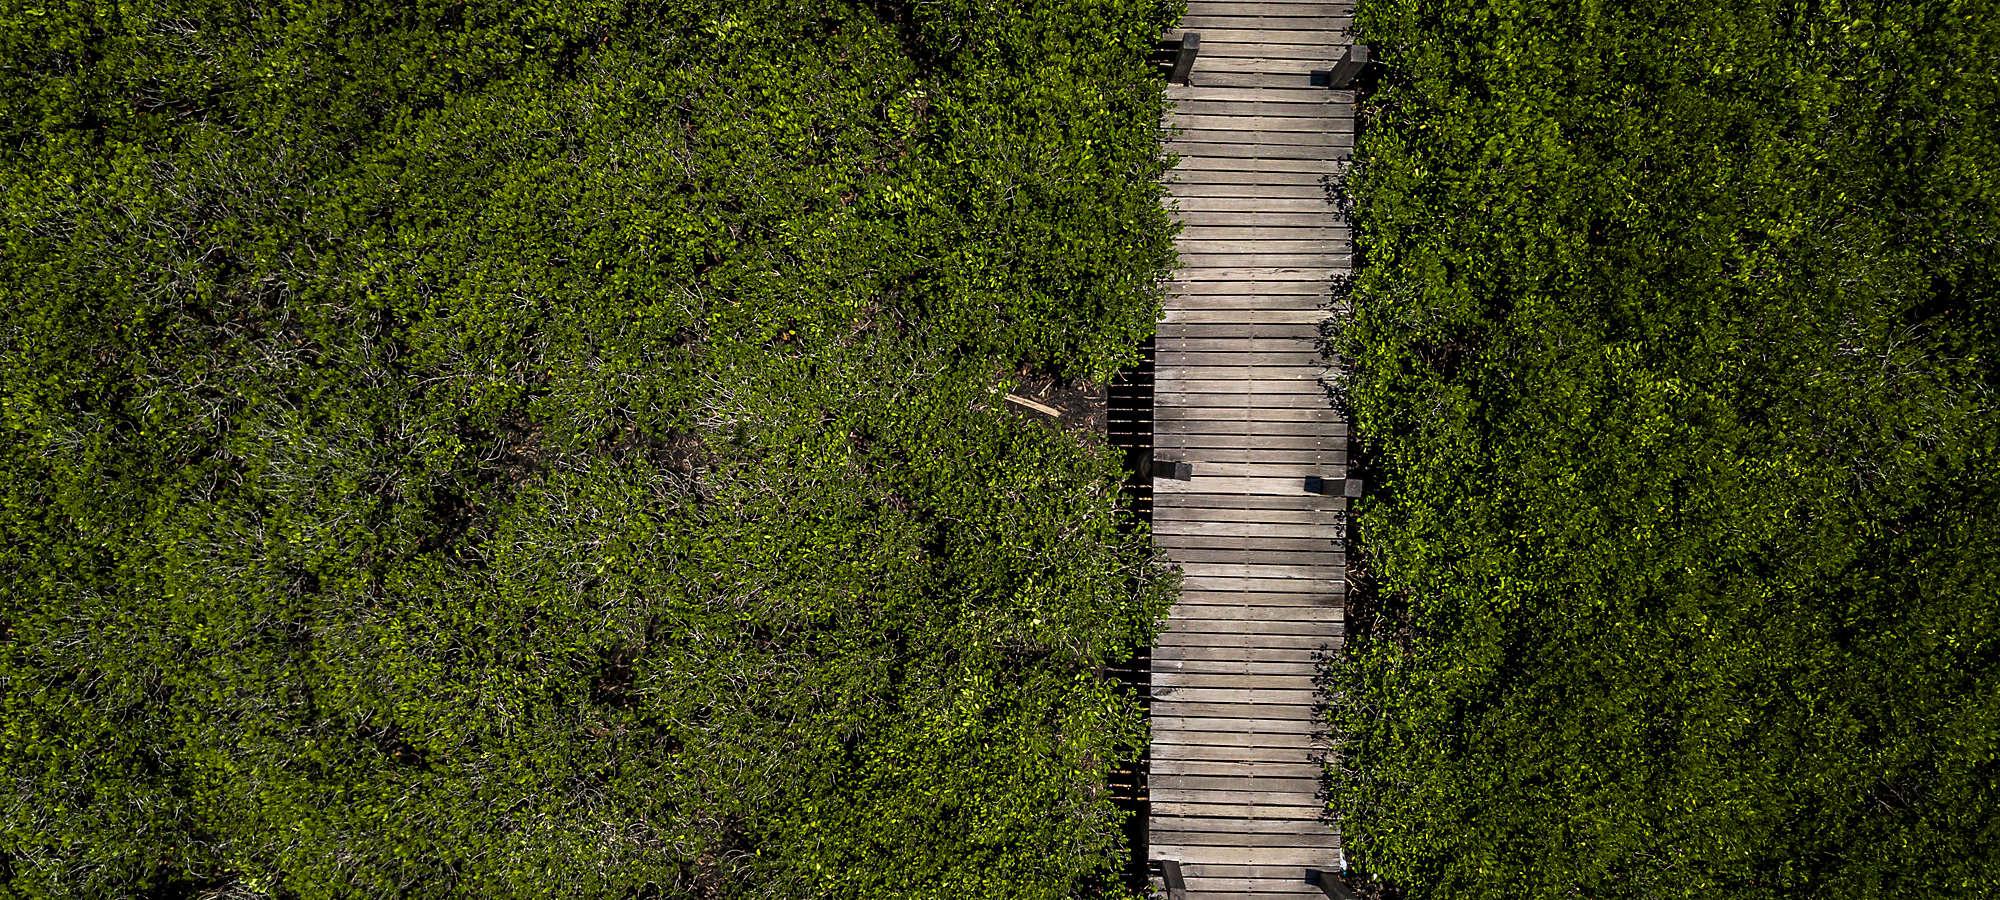 Aerial wooden bridge walkway forest